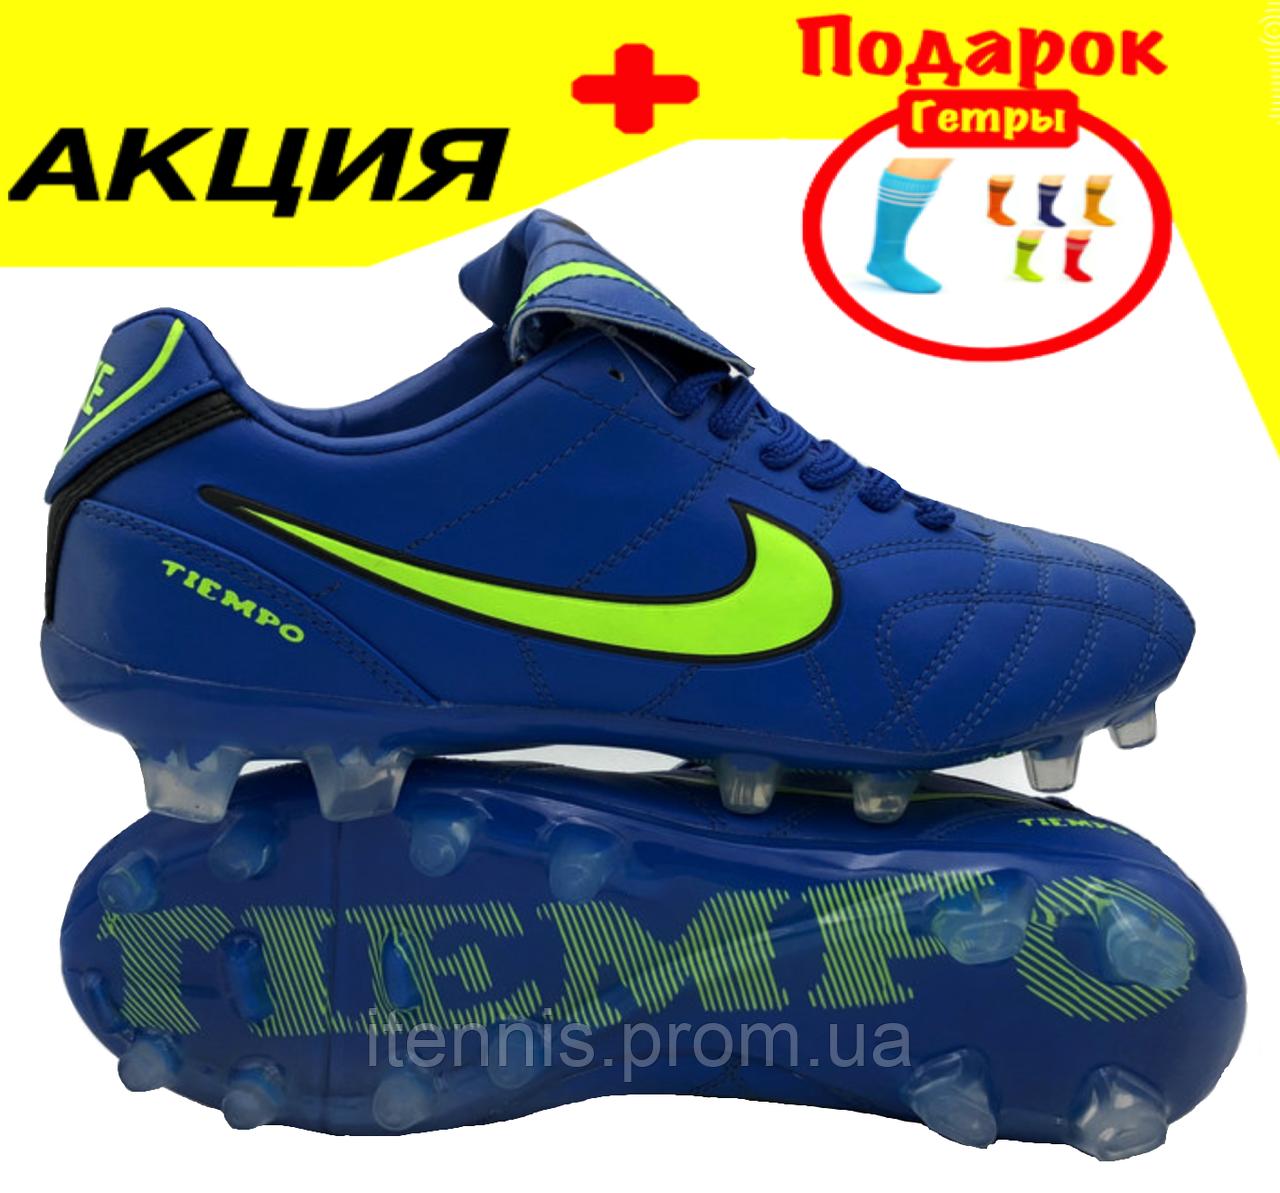 Футбольные бутсы Nike TIEMPO (р.40-44) NEW U-007T-3